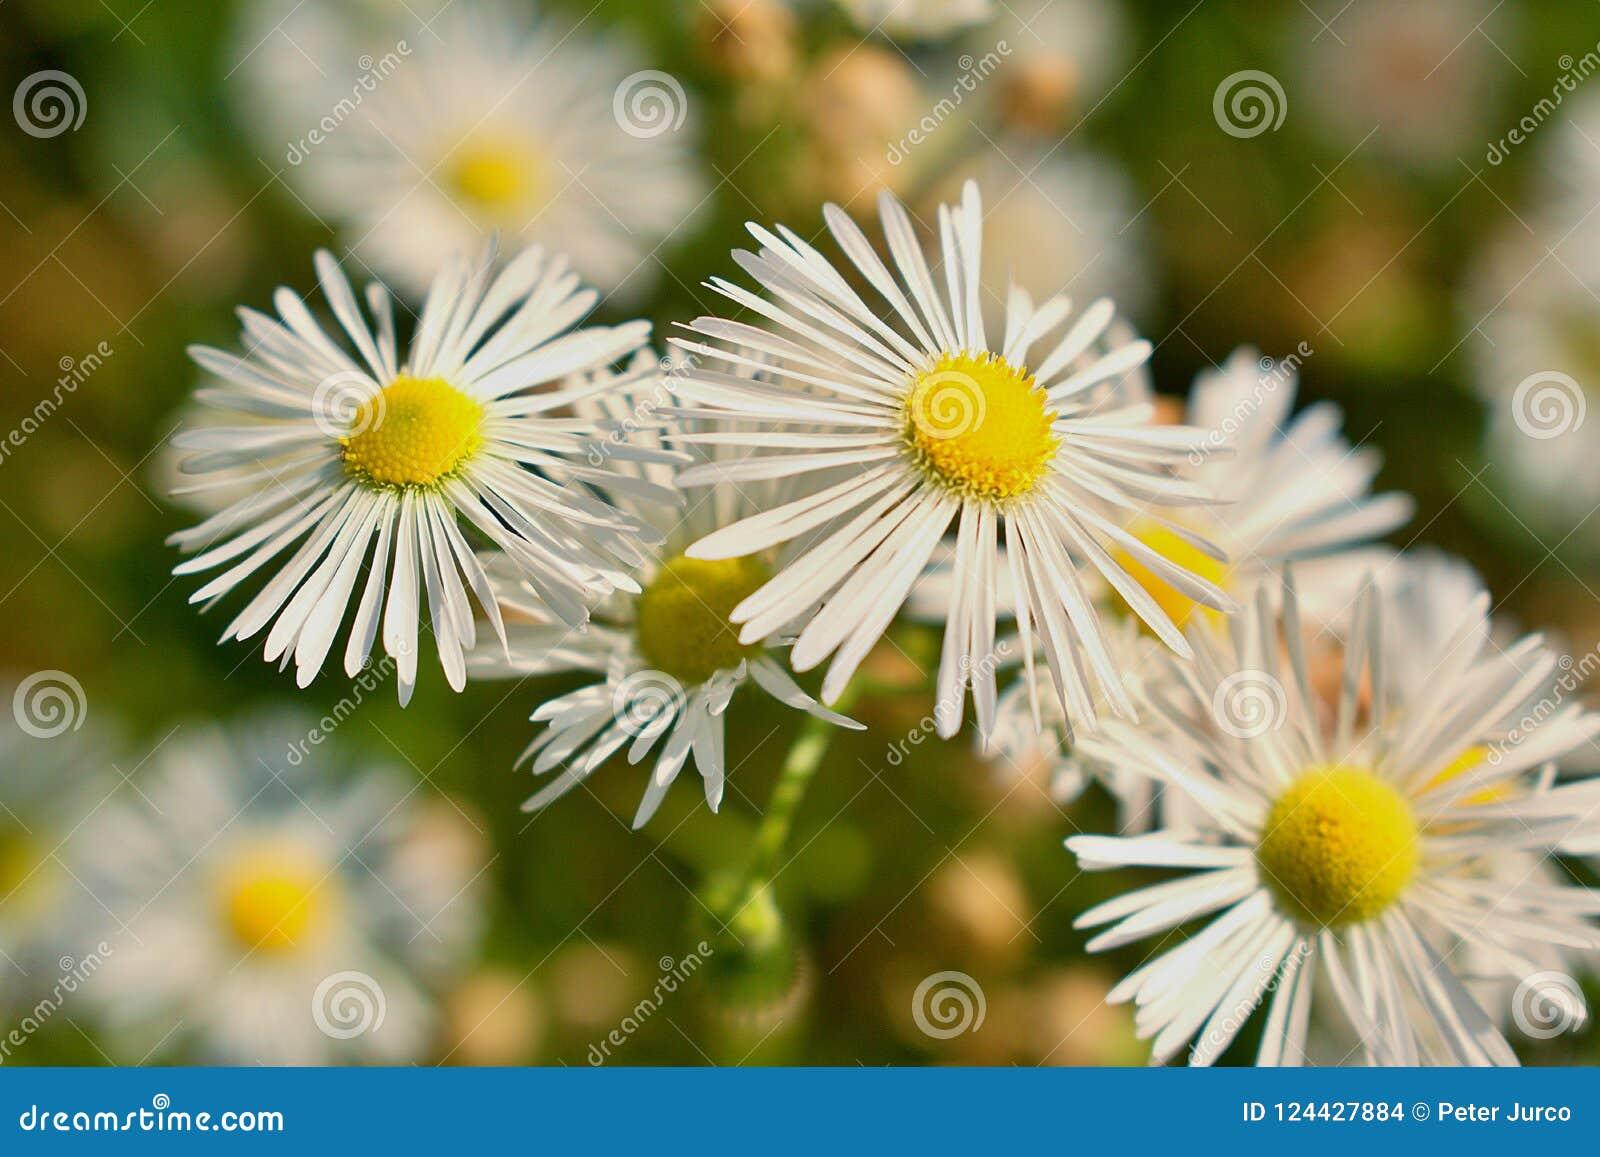 Download Leucanthemum - detail stock photo. Image of plant, central - 124427884